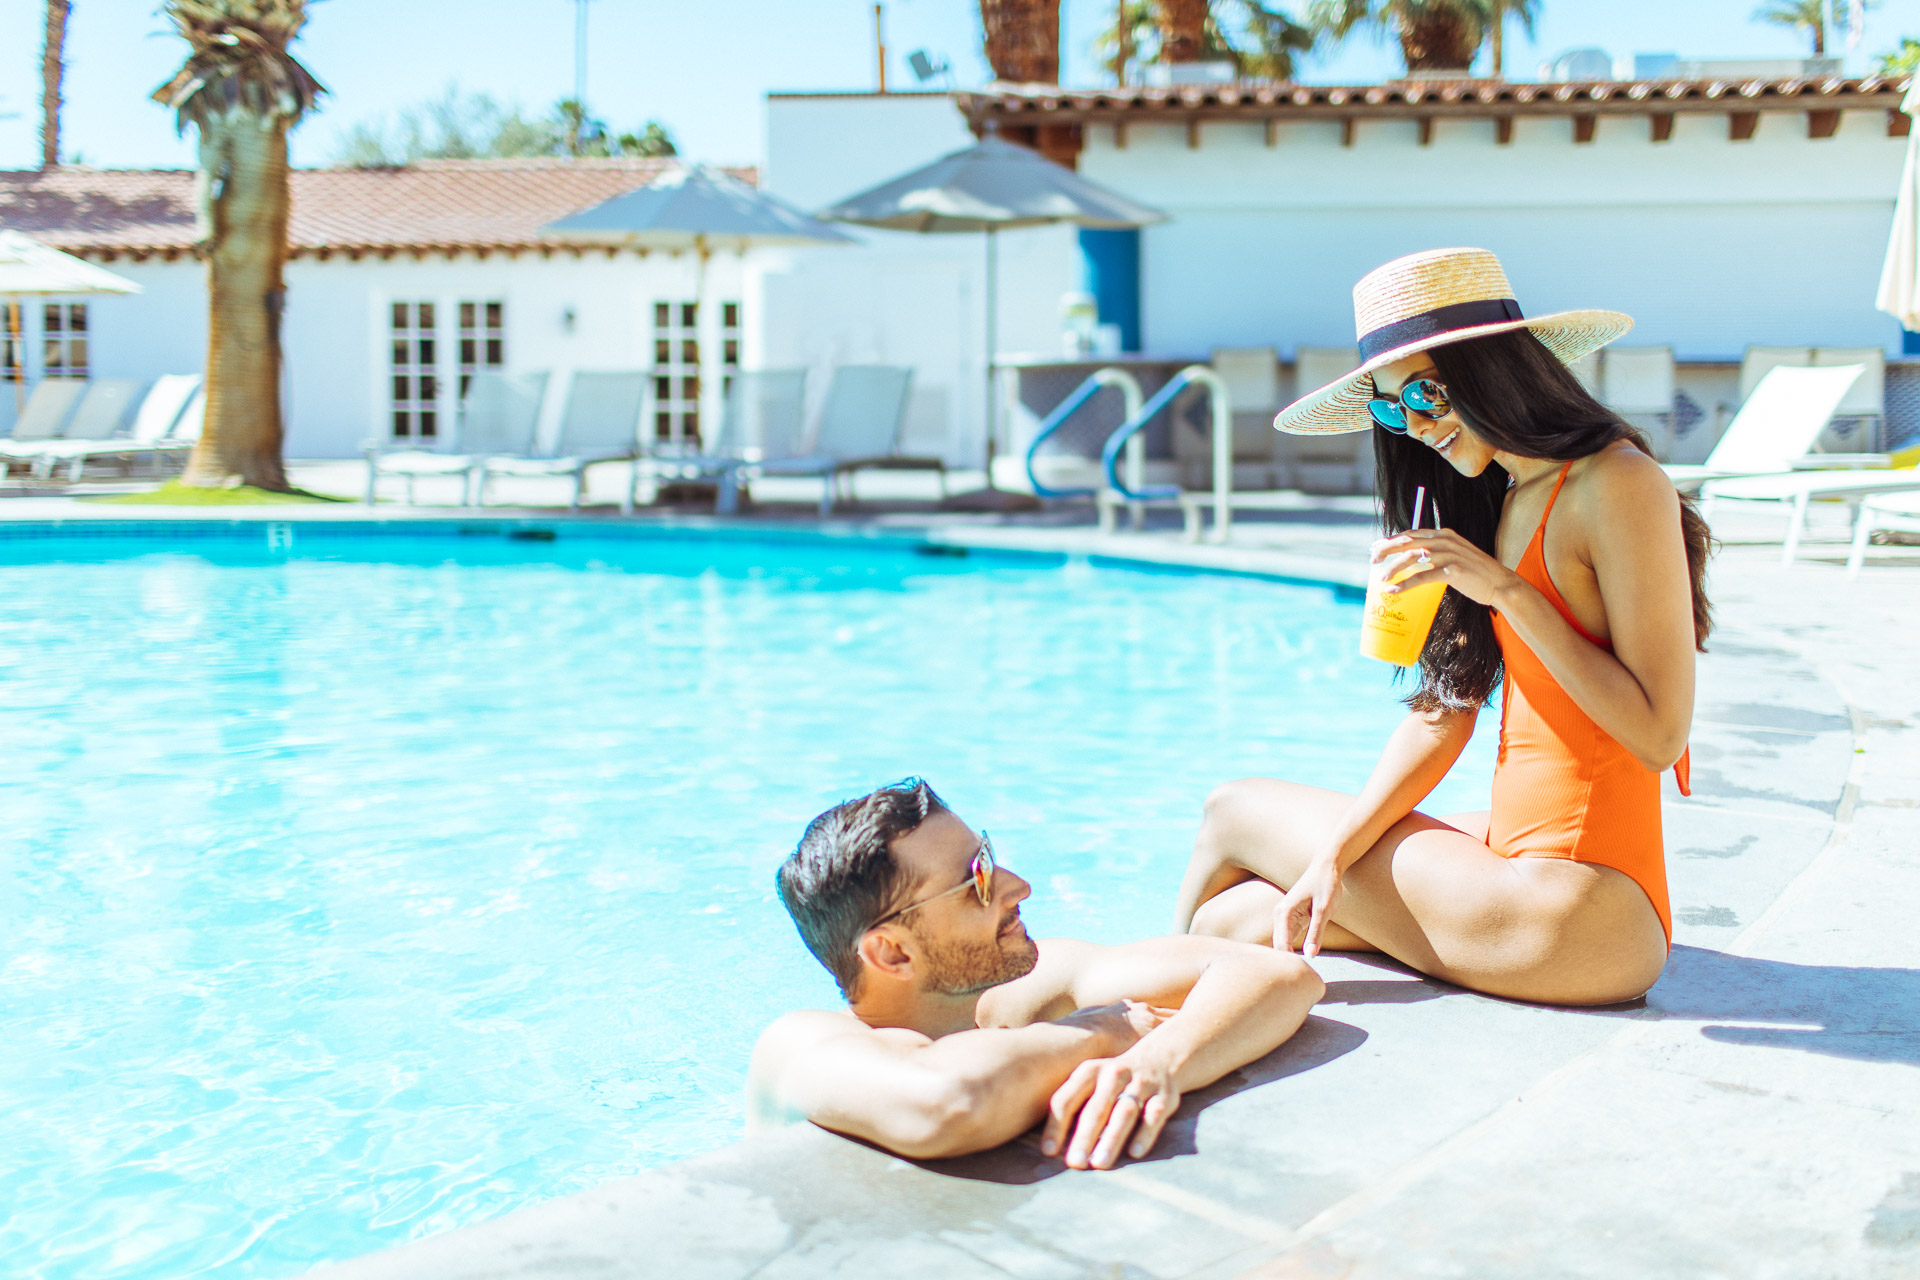 palm-springs-california-hotel-lifestyle-photographer-la-quinta-resort-club-12.jpg